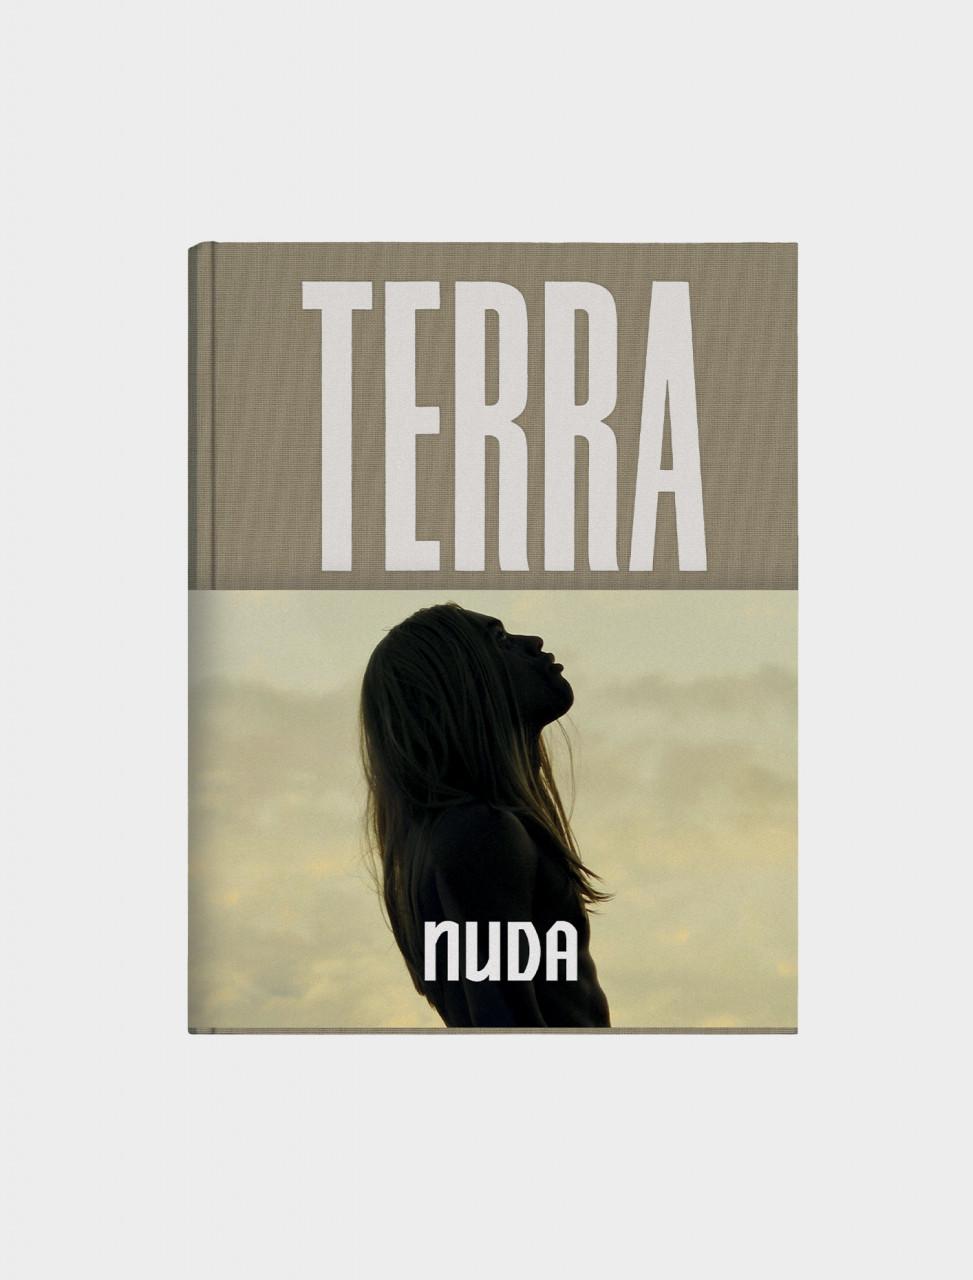 1000703 NUDA TERRA